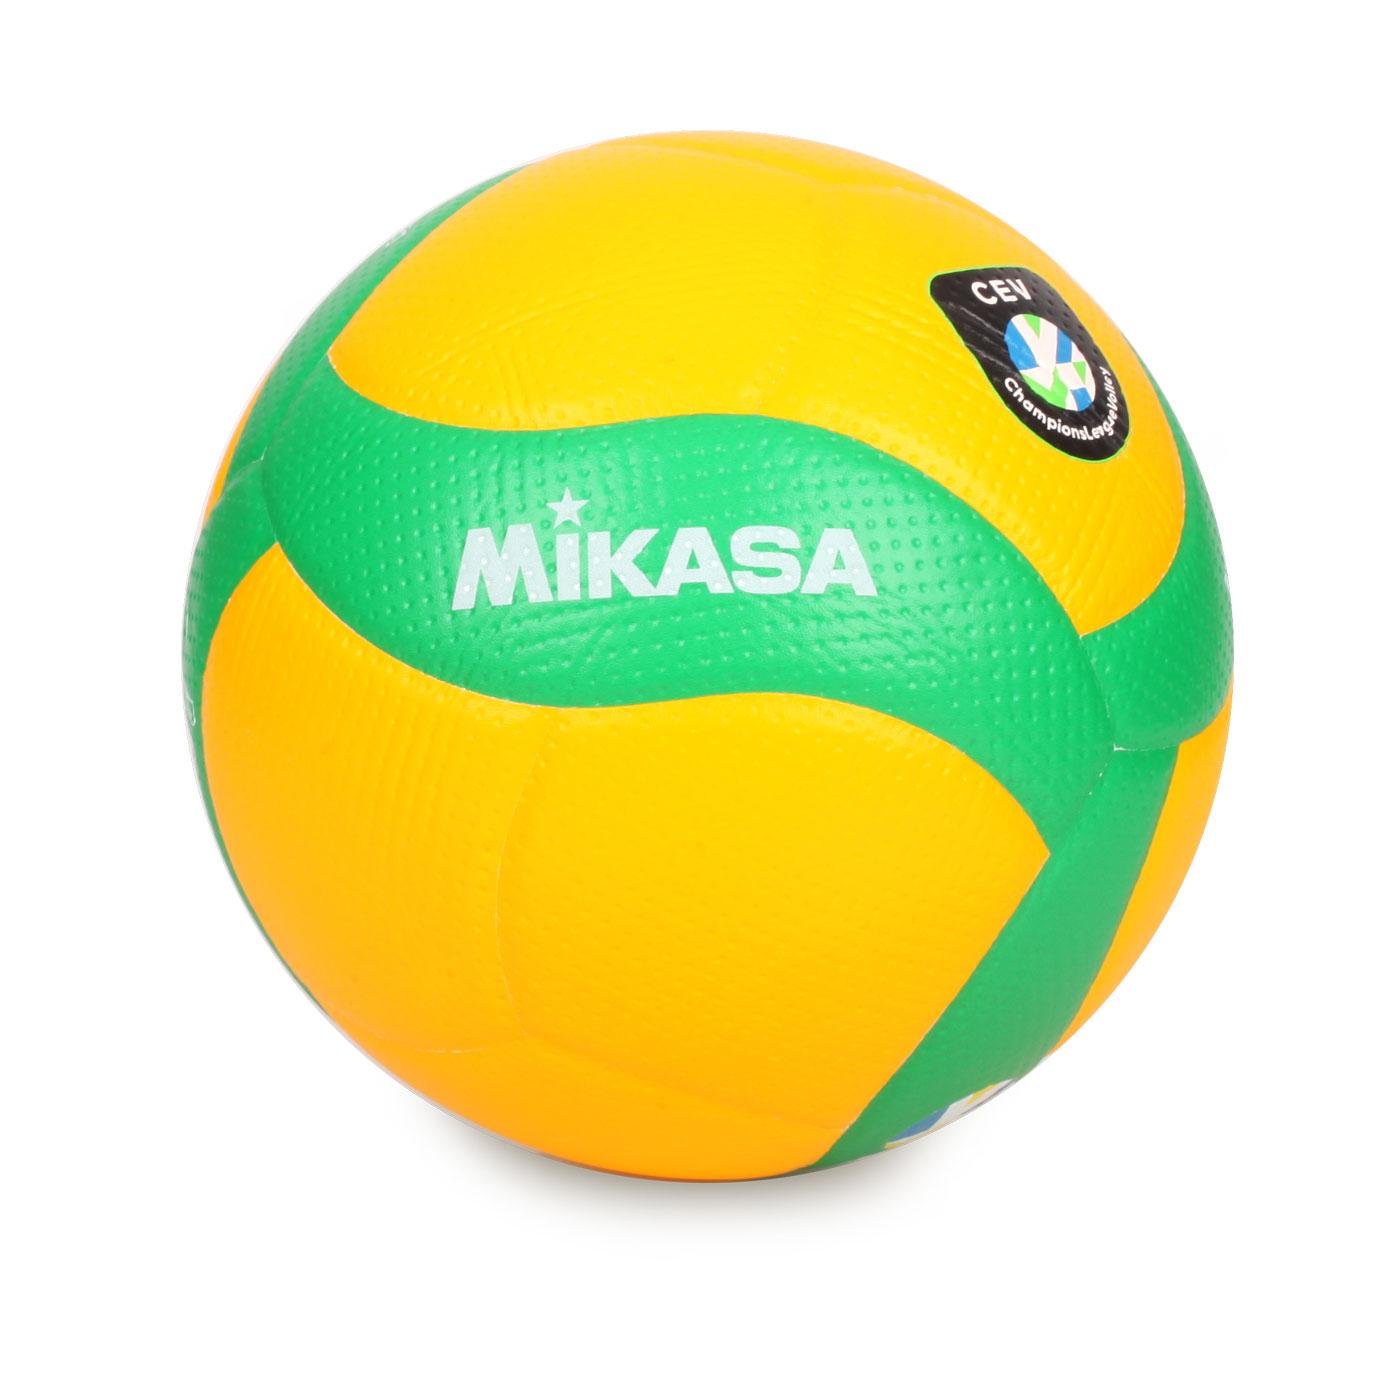 MIKASA 歐冠專用比賽用排球#5 KMV200WCEV